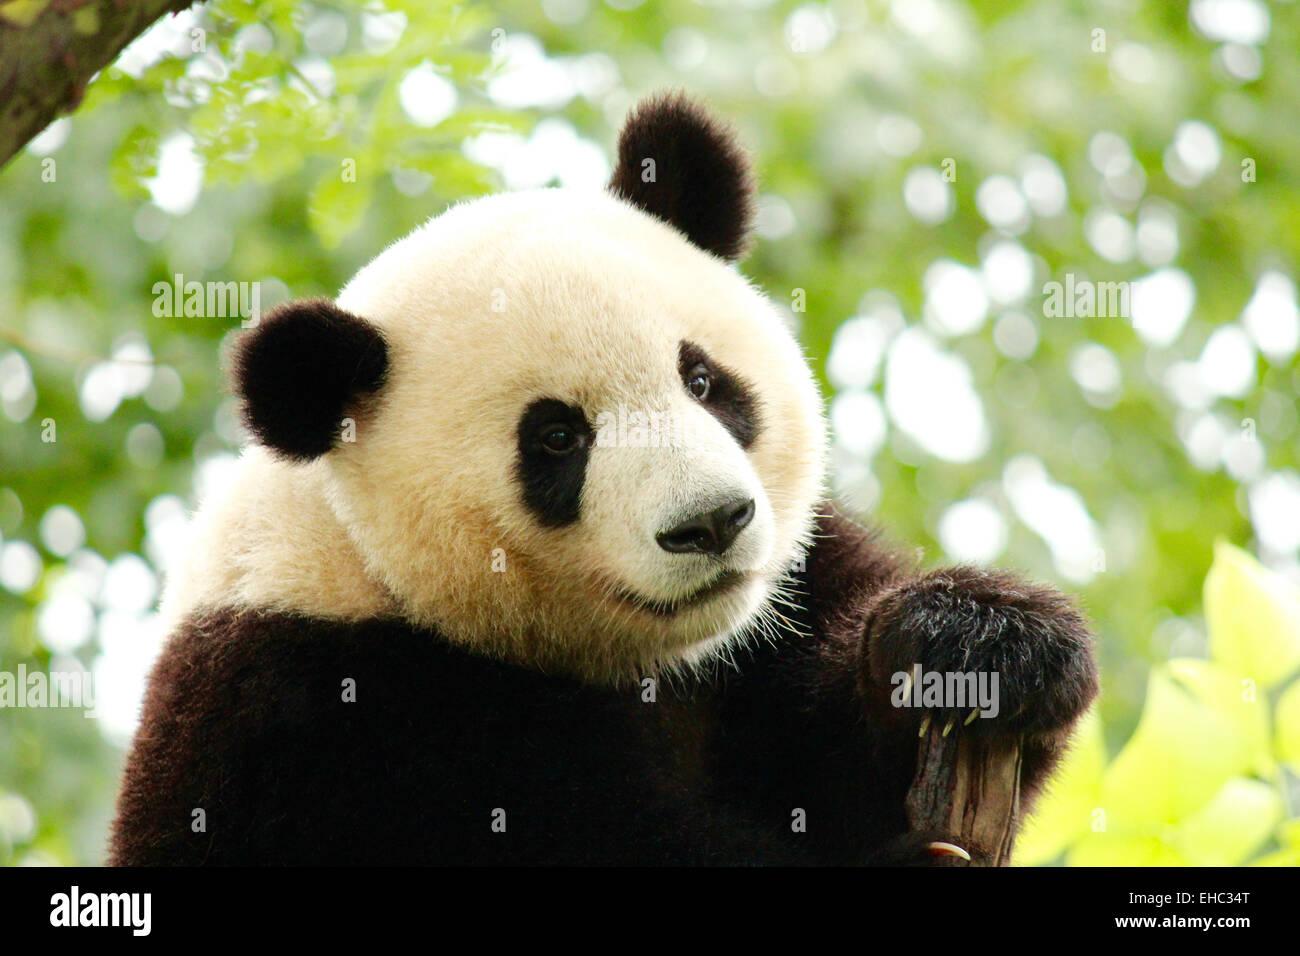 Close-up of a Giant Panda. - Stock Image